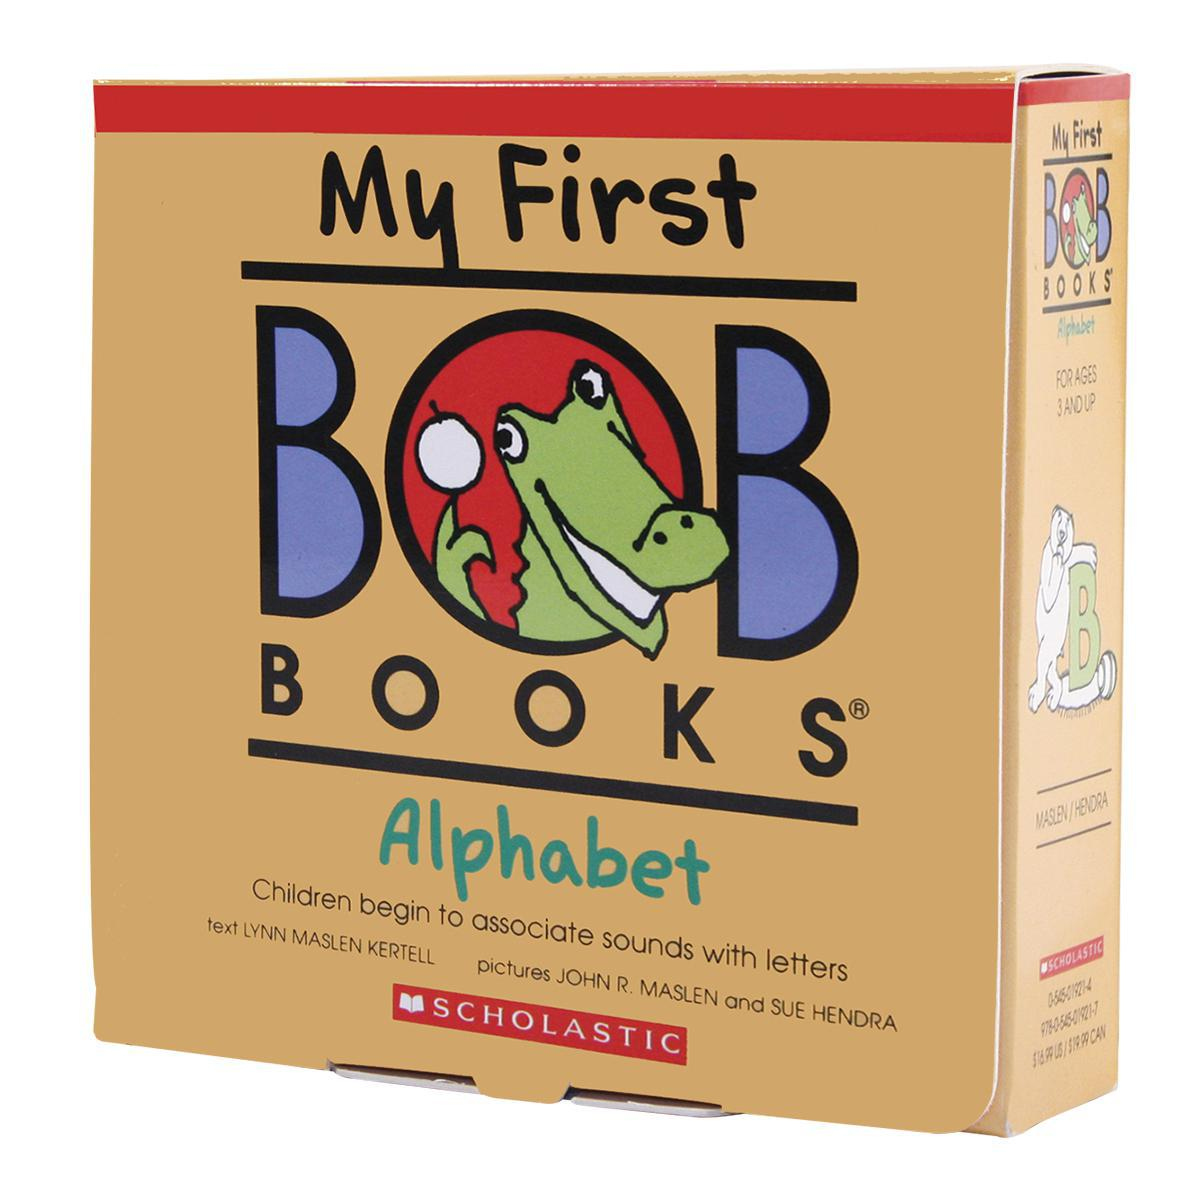 My First BOB Books® Alphabet